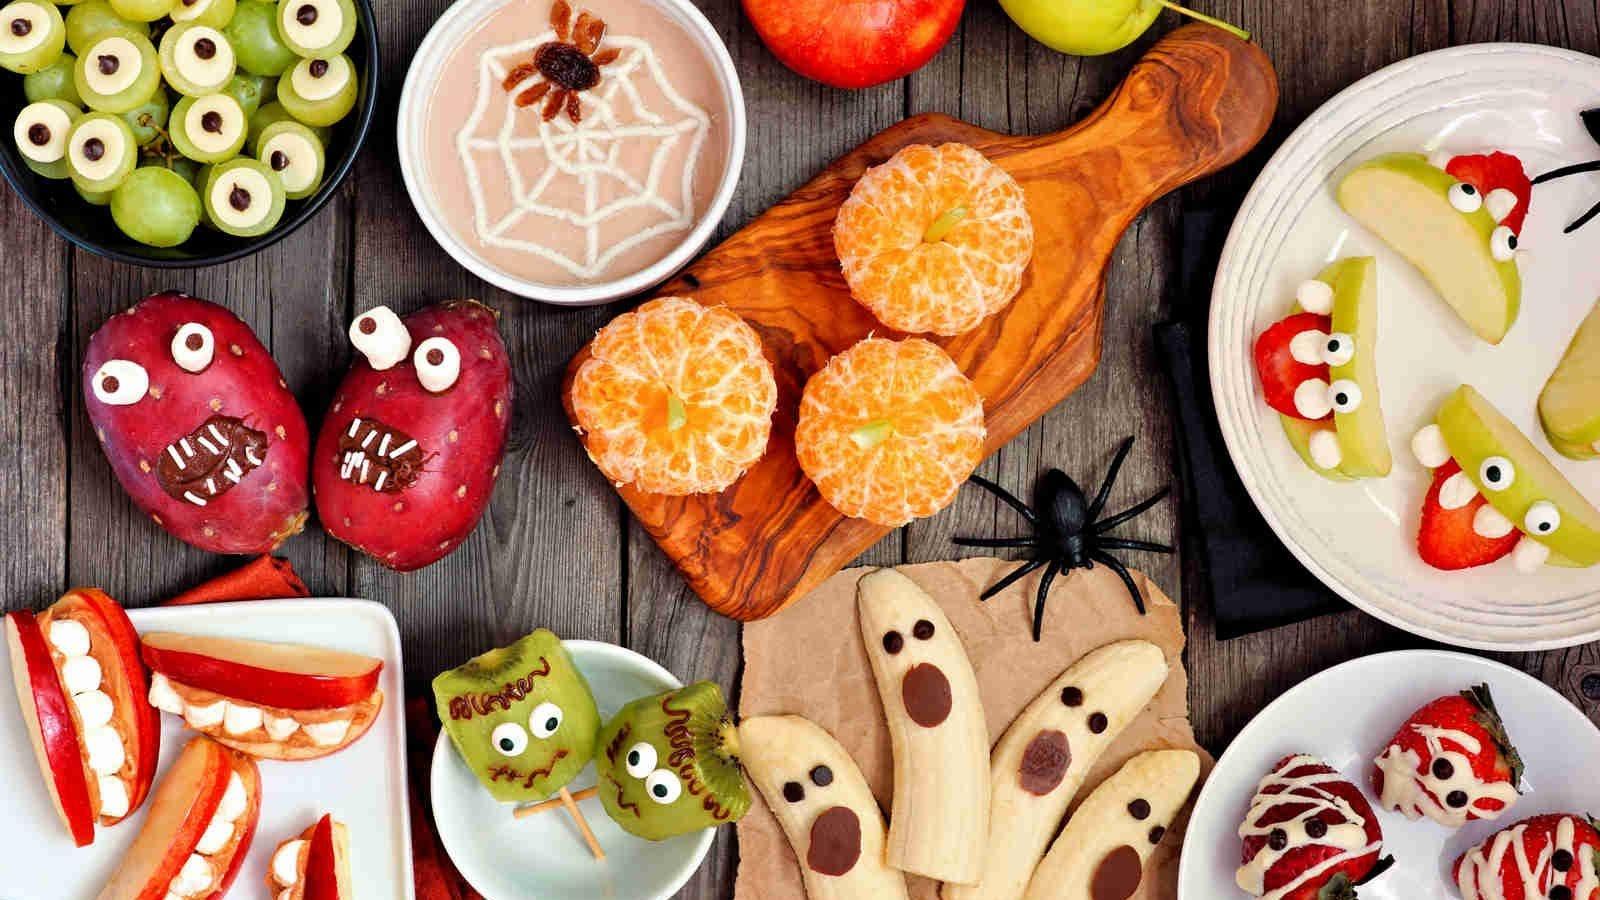 A table full of spooky Halloween treats.